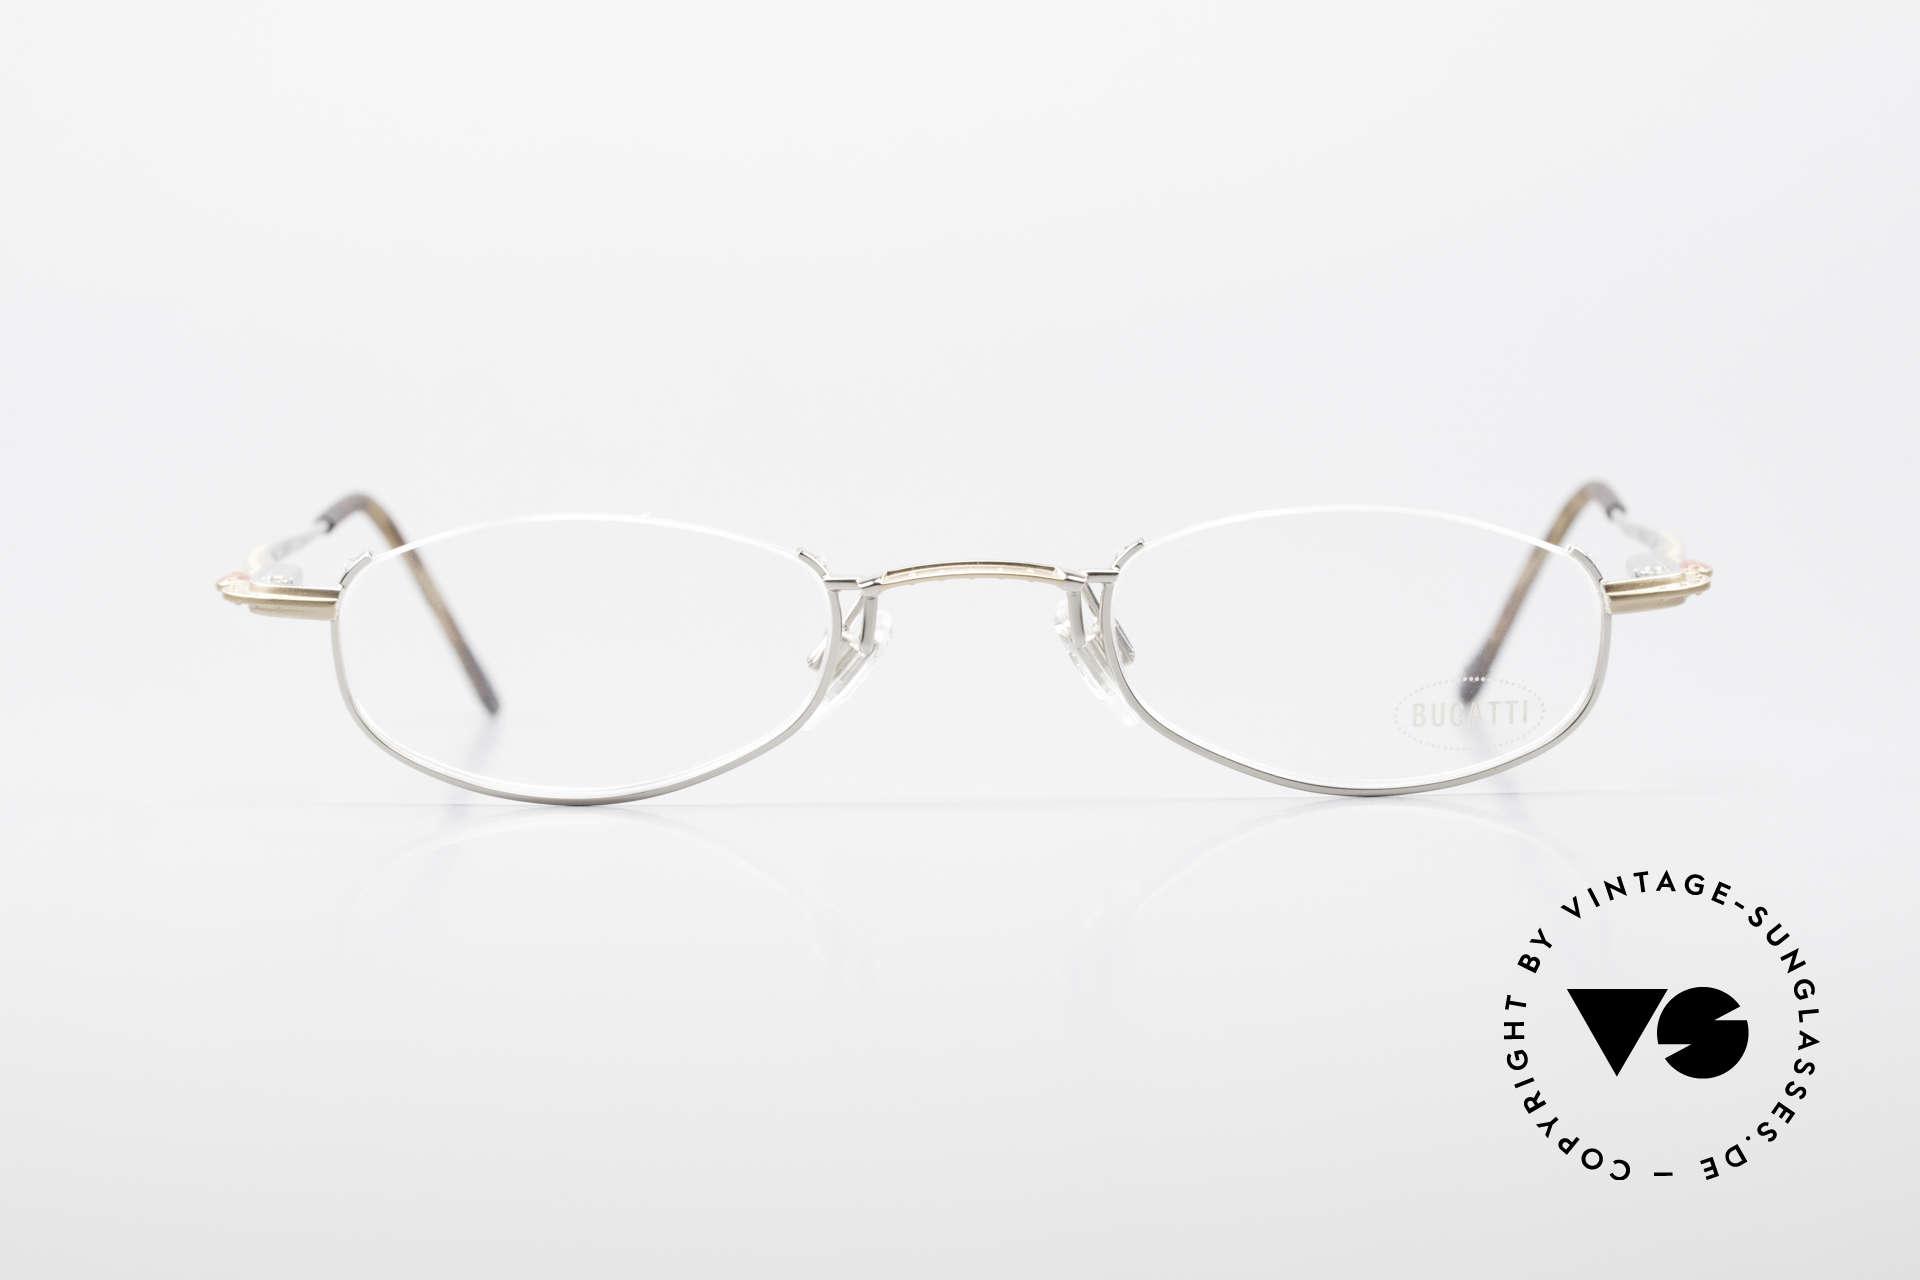 Bugatti 23668 High-Tech Reading Eyeglasses, lightweight frame (17g) with flexible spring hinges, Made for Men